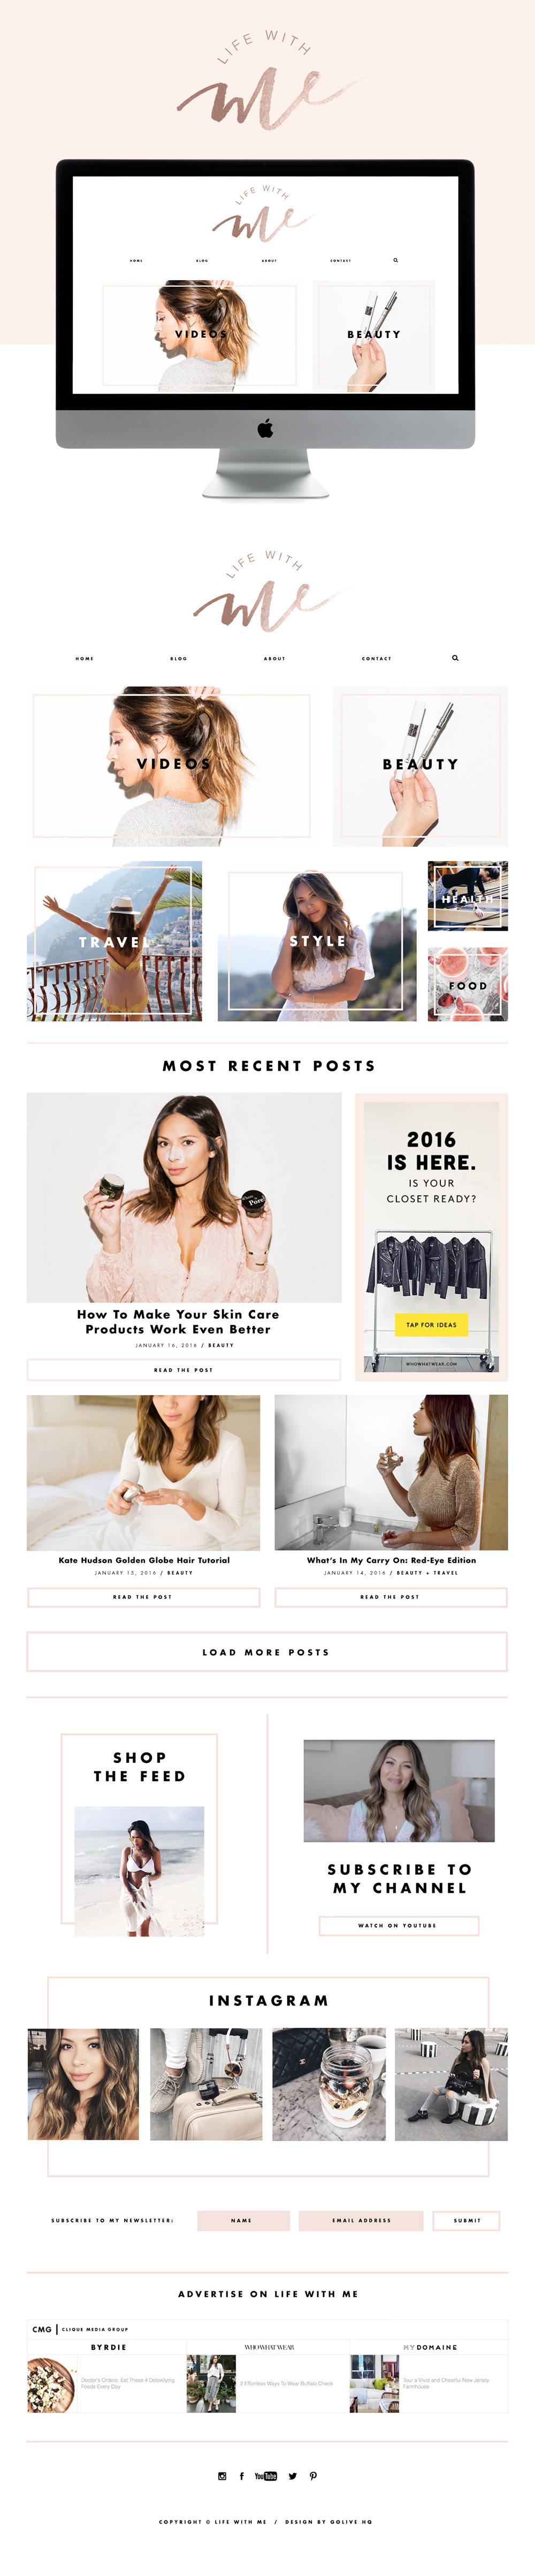 modern wordpress fashion blog design  |  by GOLIVEHQ.CO